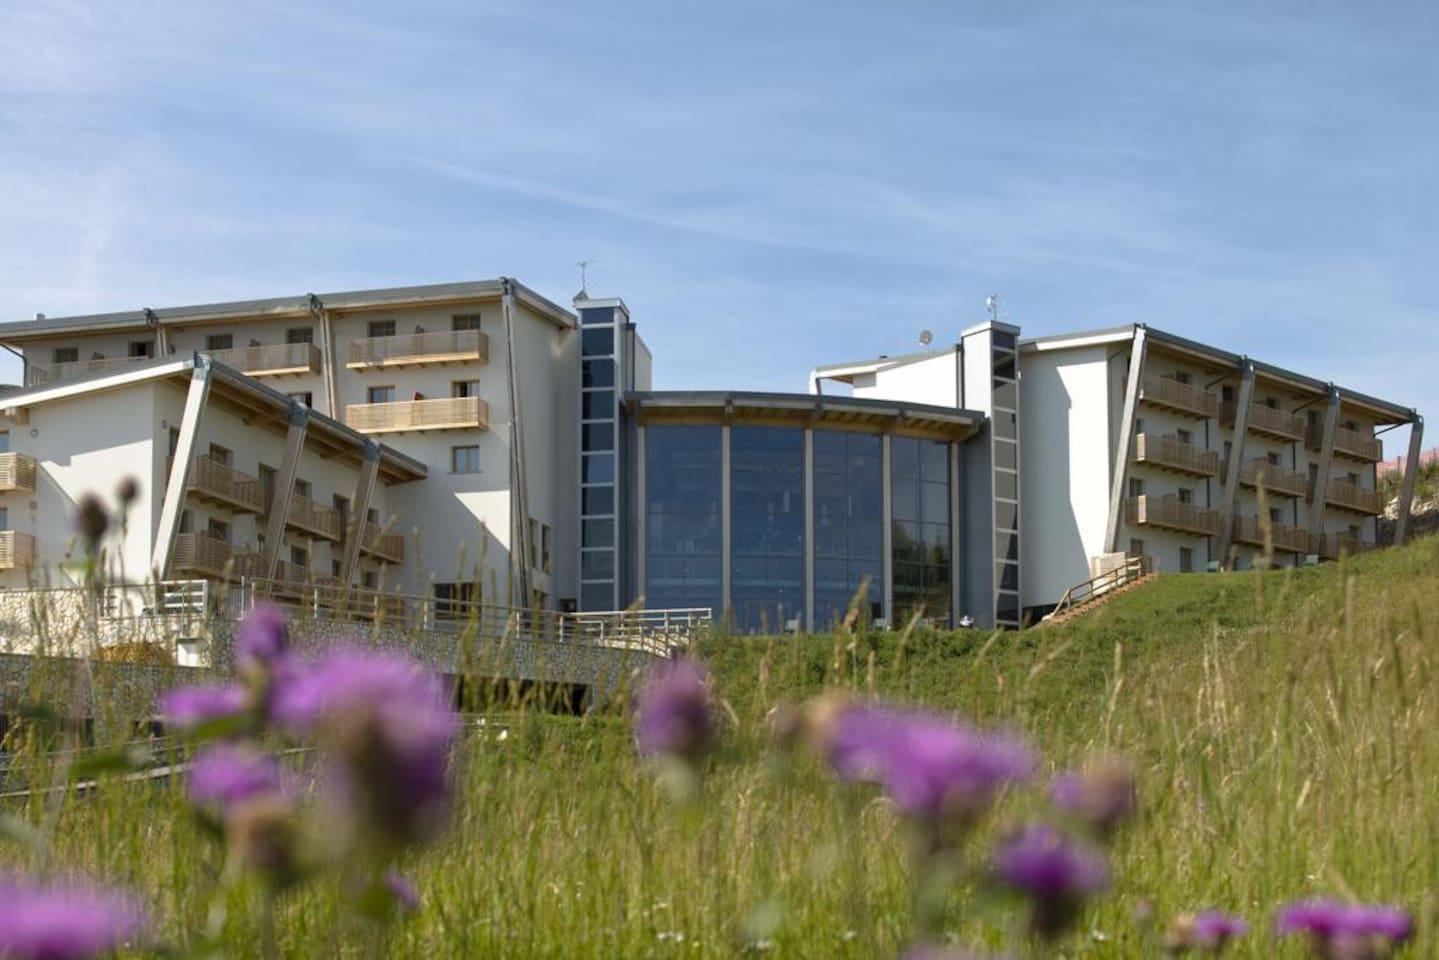 Il complesso, albergo e residence